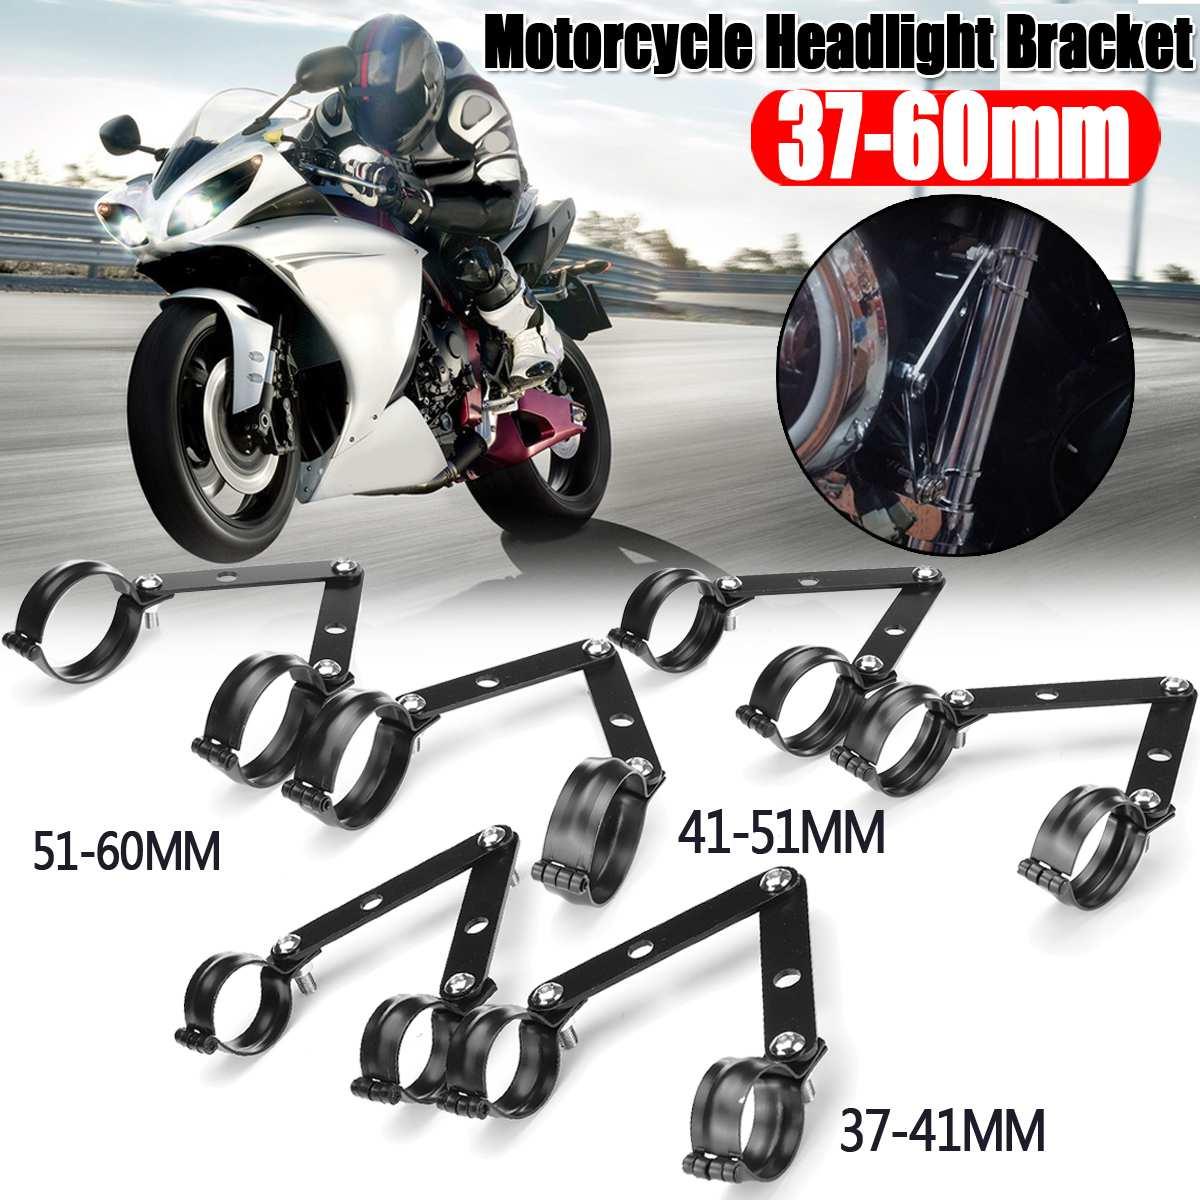 37-41mm 41-51mm 51-61mm Universal Motorcycle Headlight Bracket Mounting Adjustable Fork Mount Clamp Black HeadLamp Holder